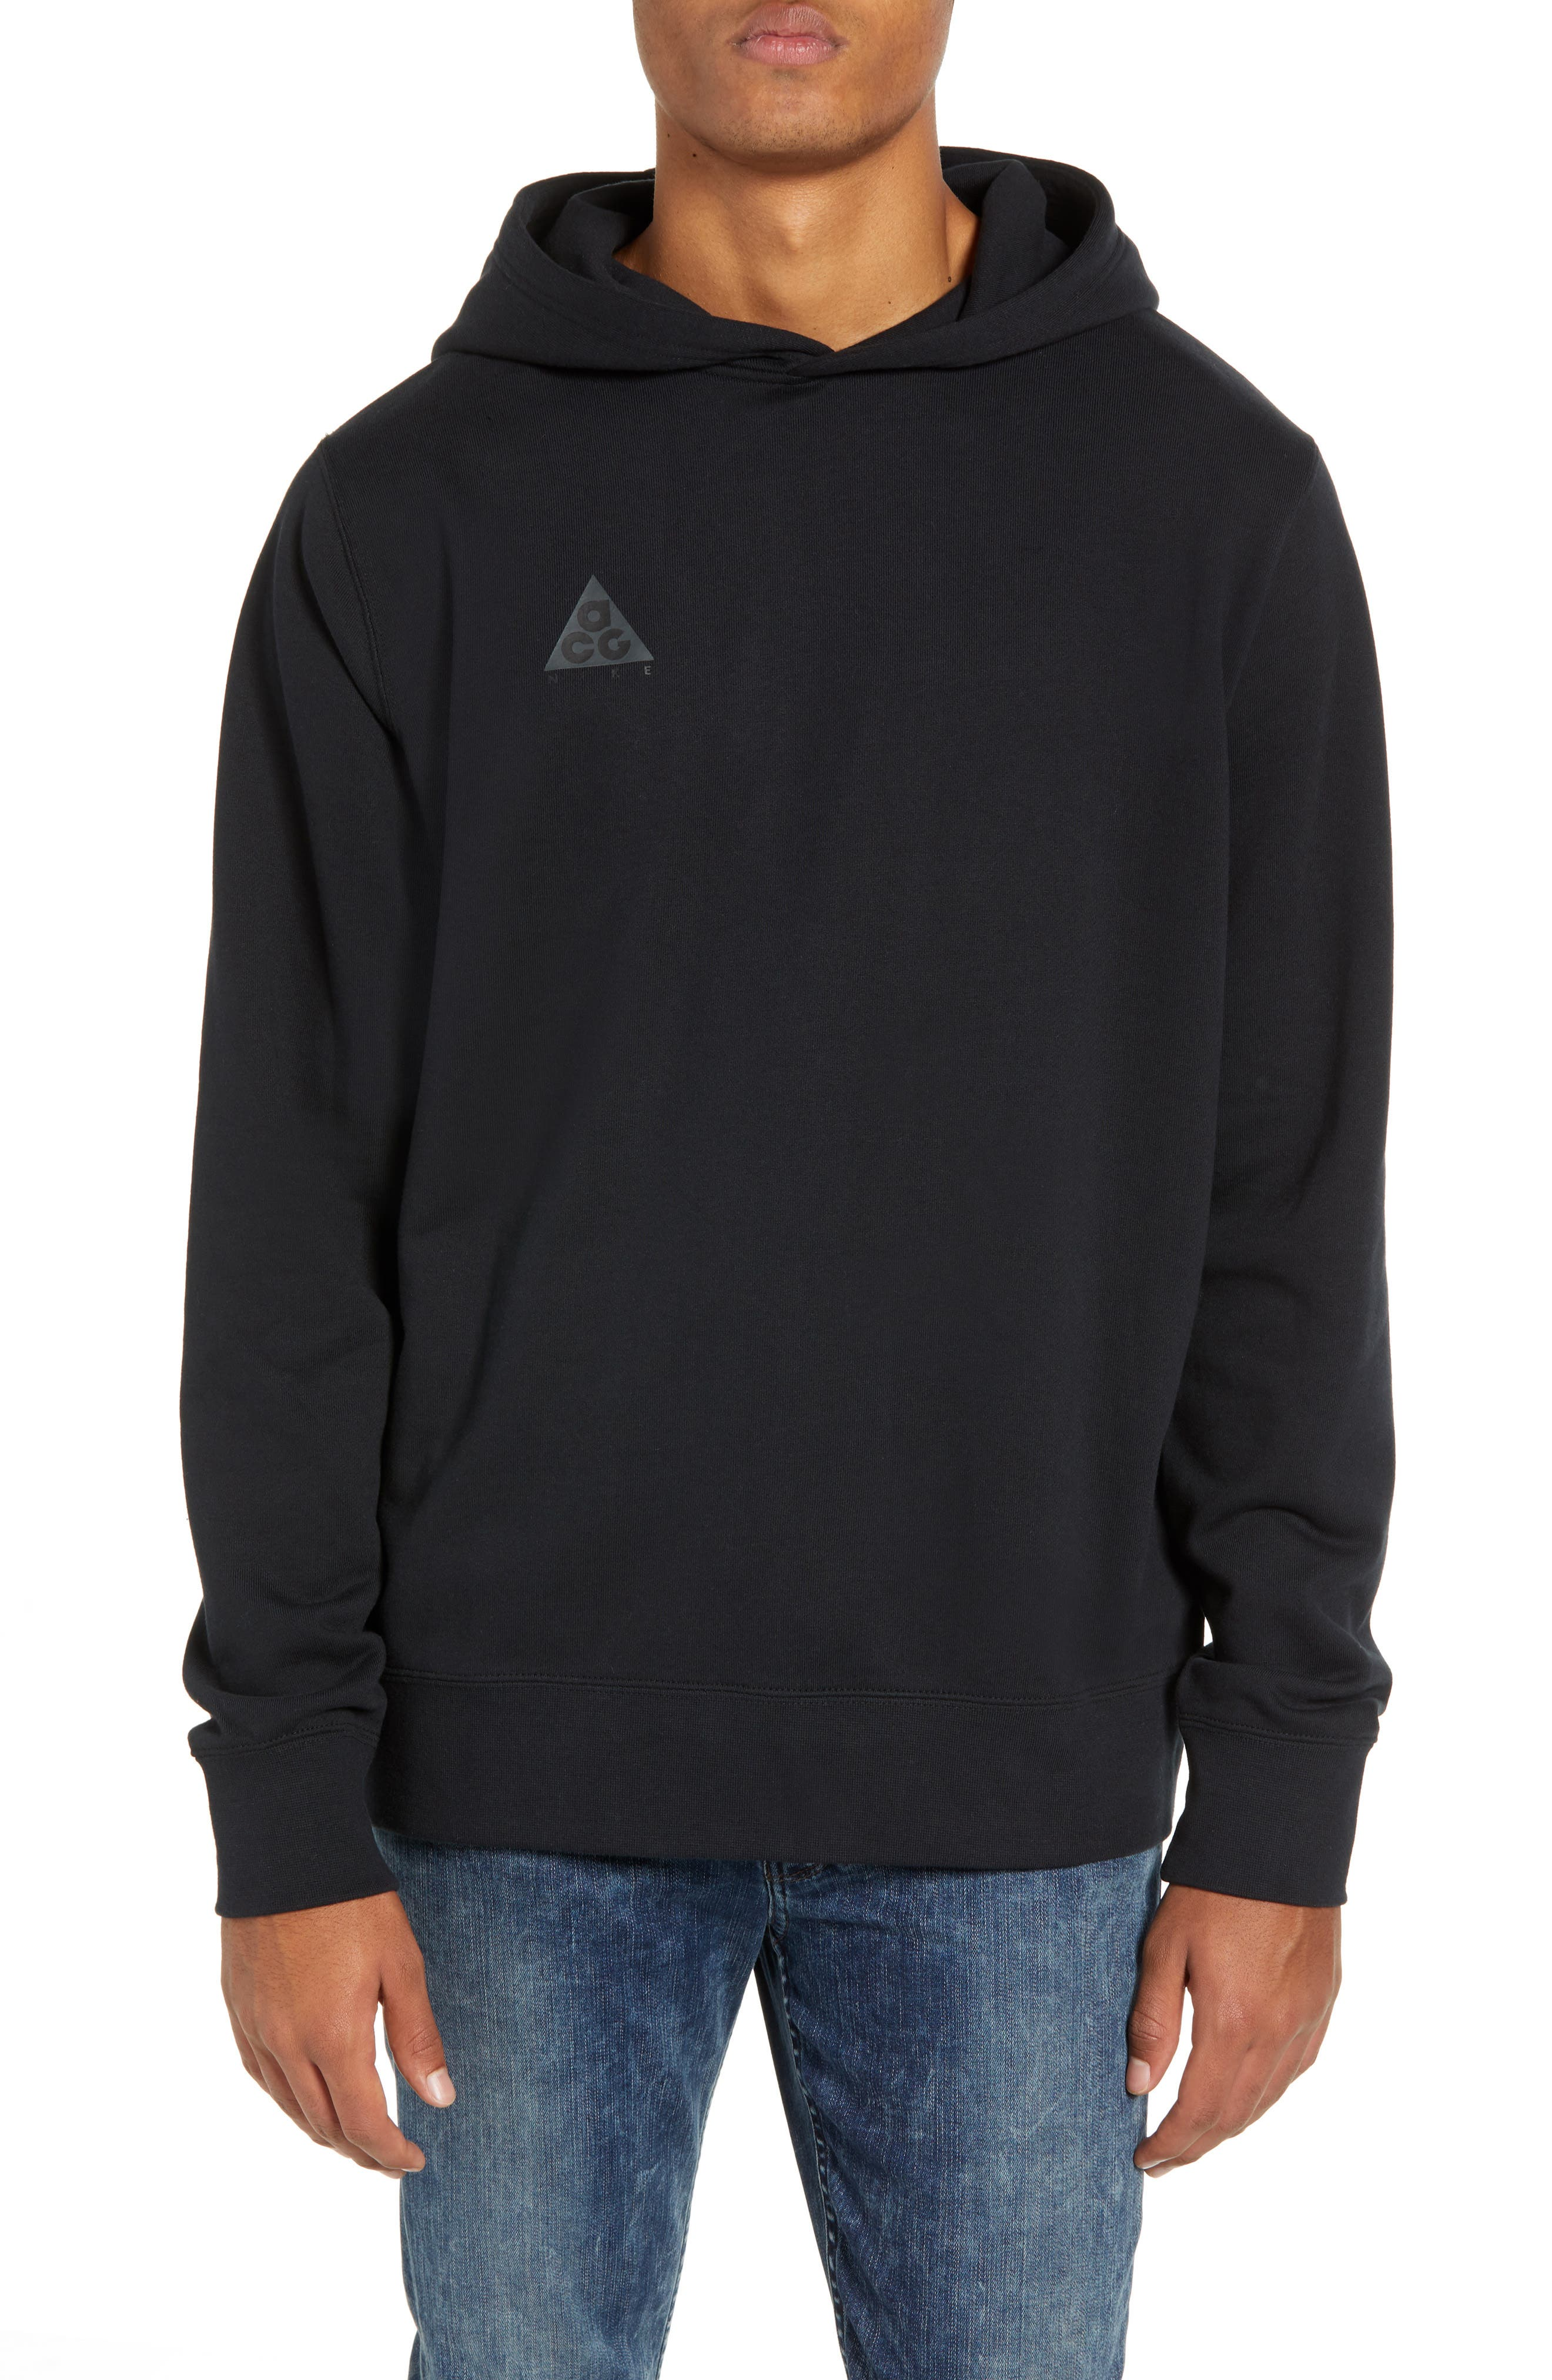 Sportswear ACG Pullover Hoodie,                             Main thumbnail 1, color,                             BLACK/ BLACK